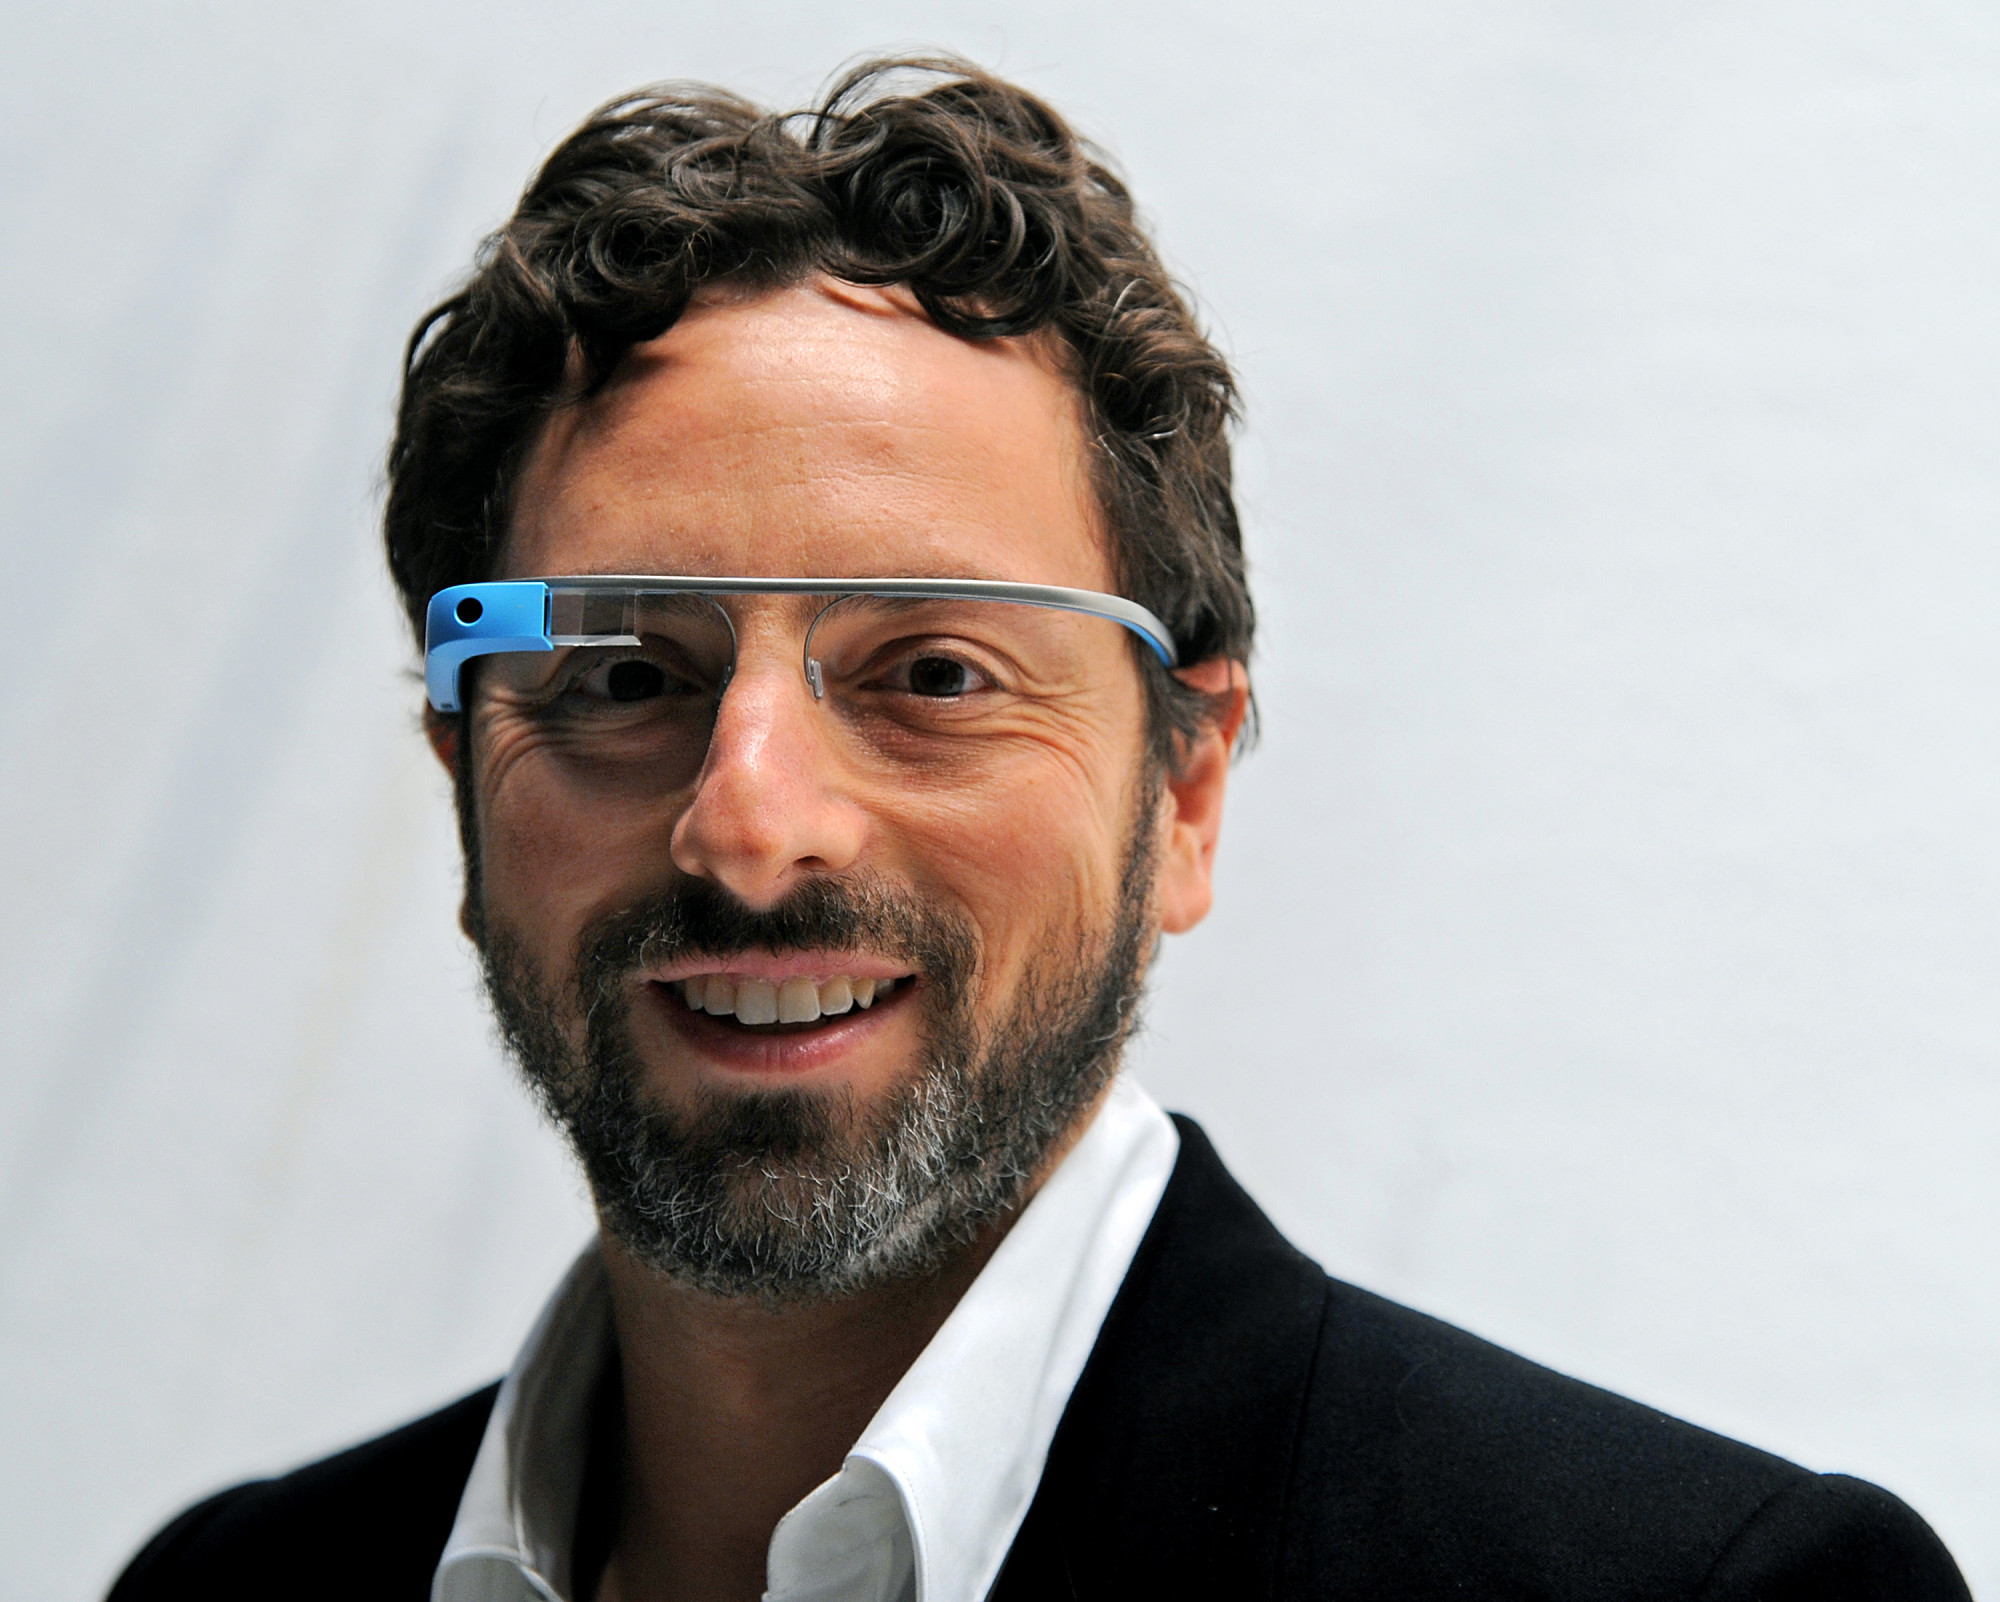 Sergey Brin - Co- Founder of Google